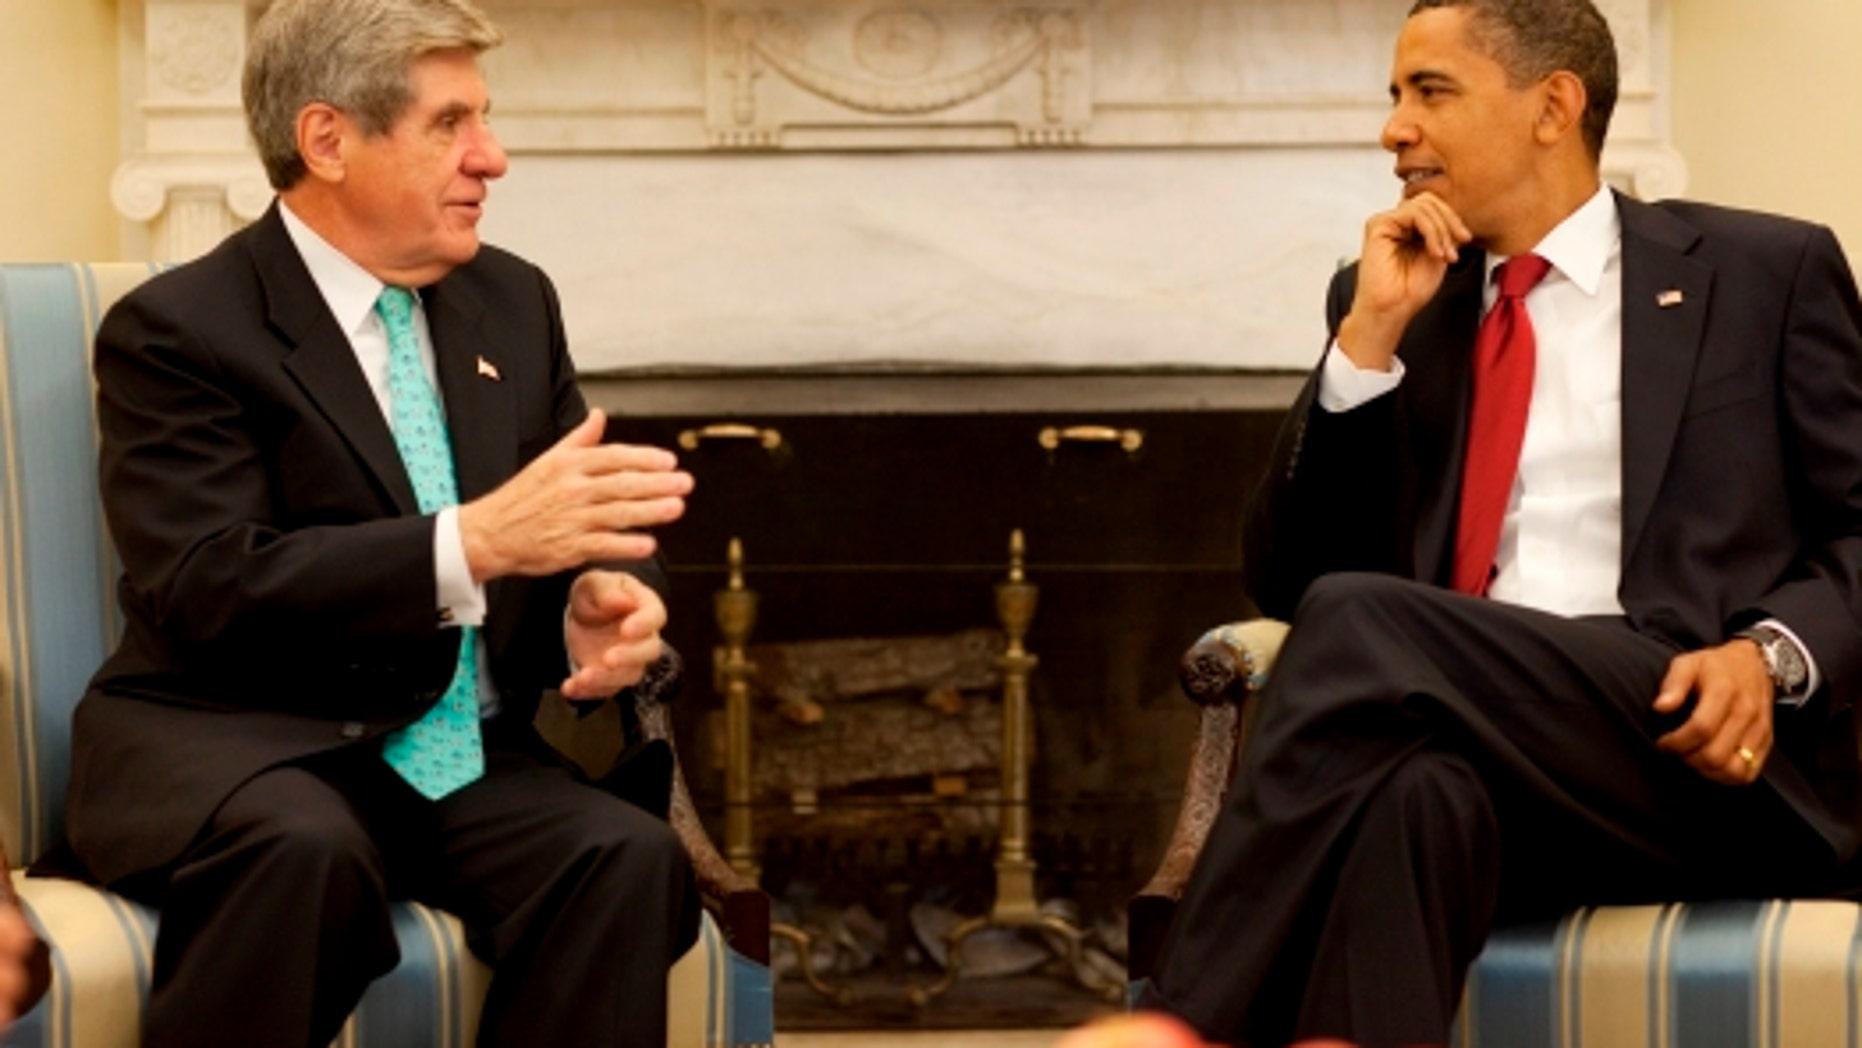 President Barack Obama meets with Senator Ben Nelson of Nebraska to discuss health care reform